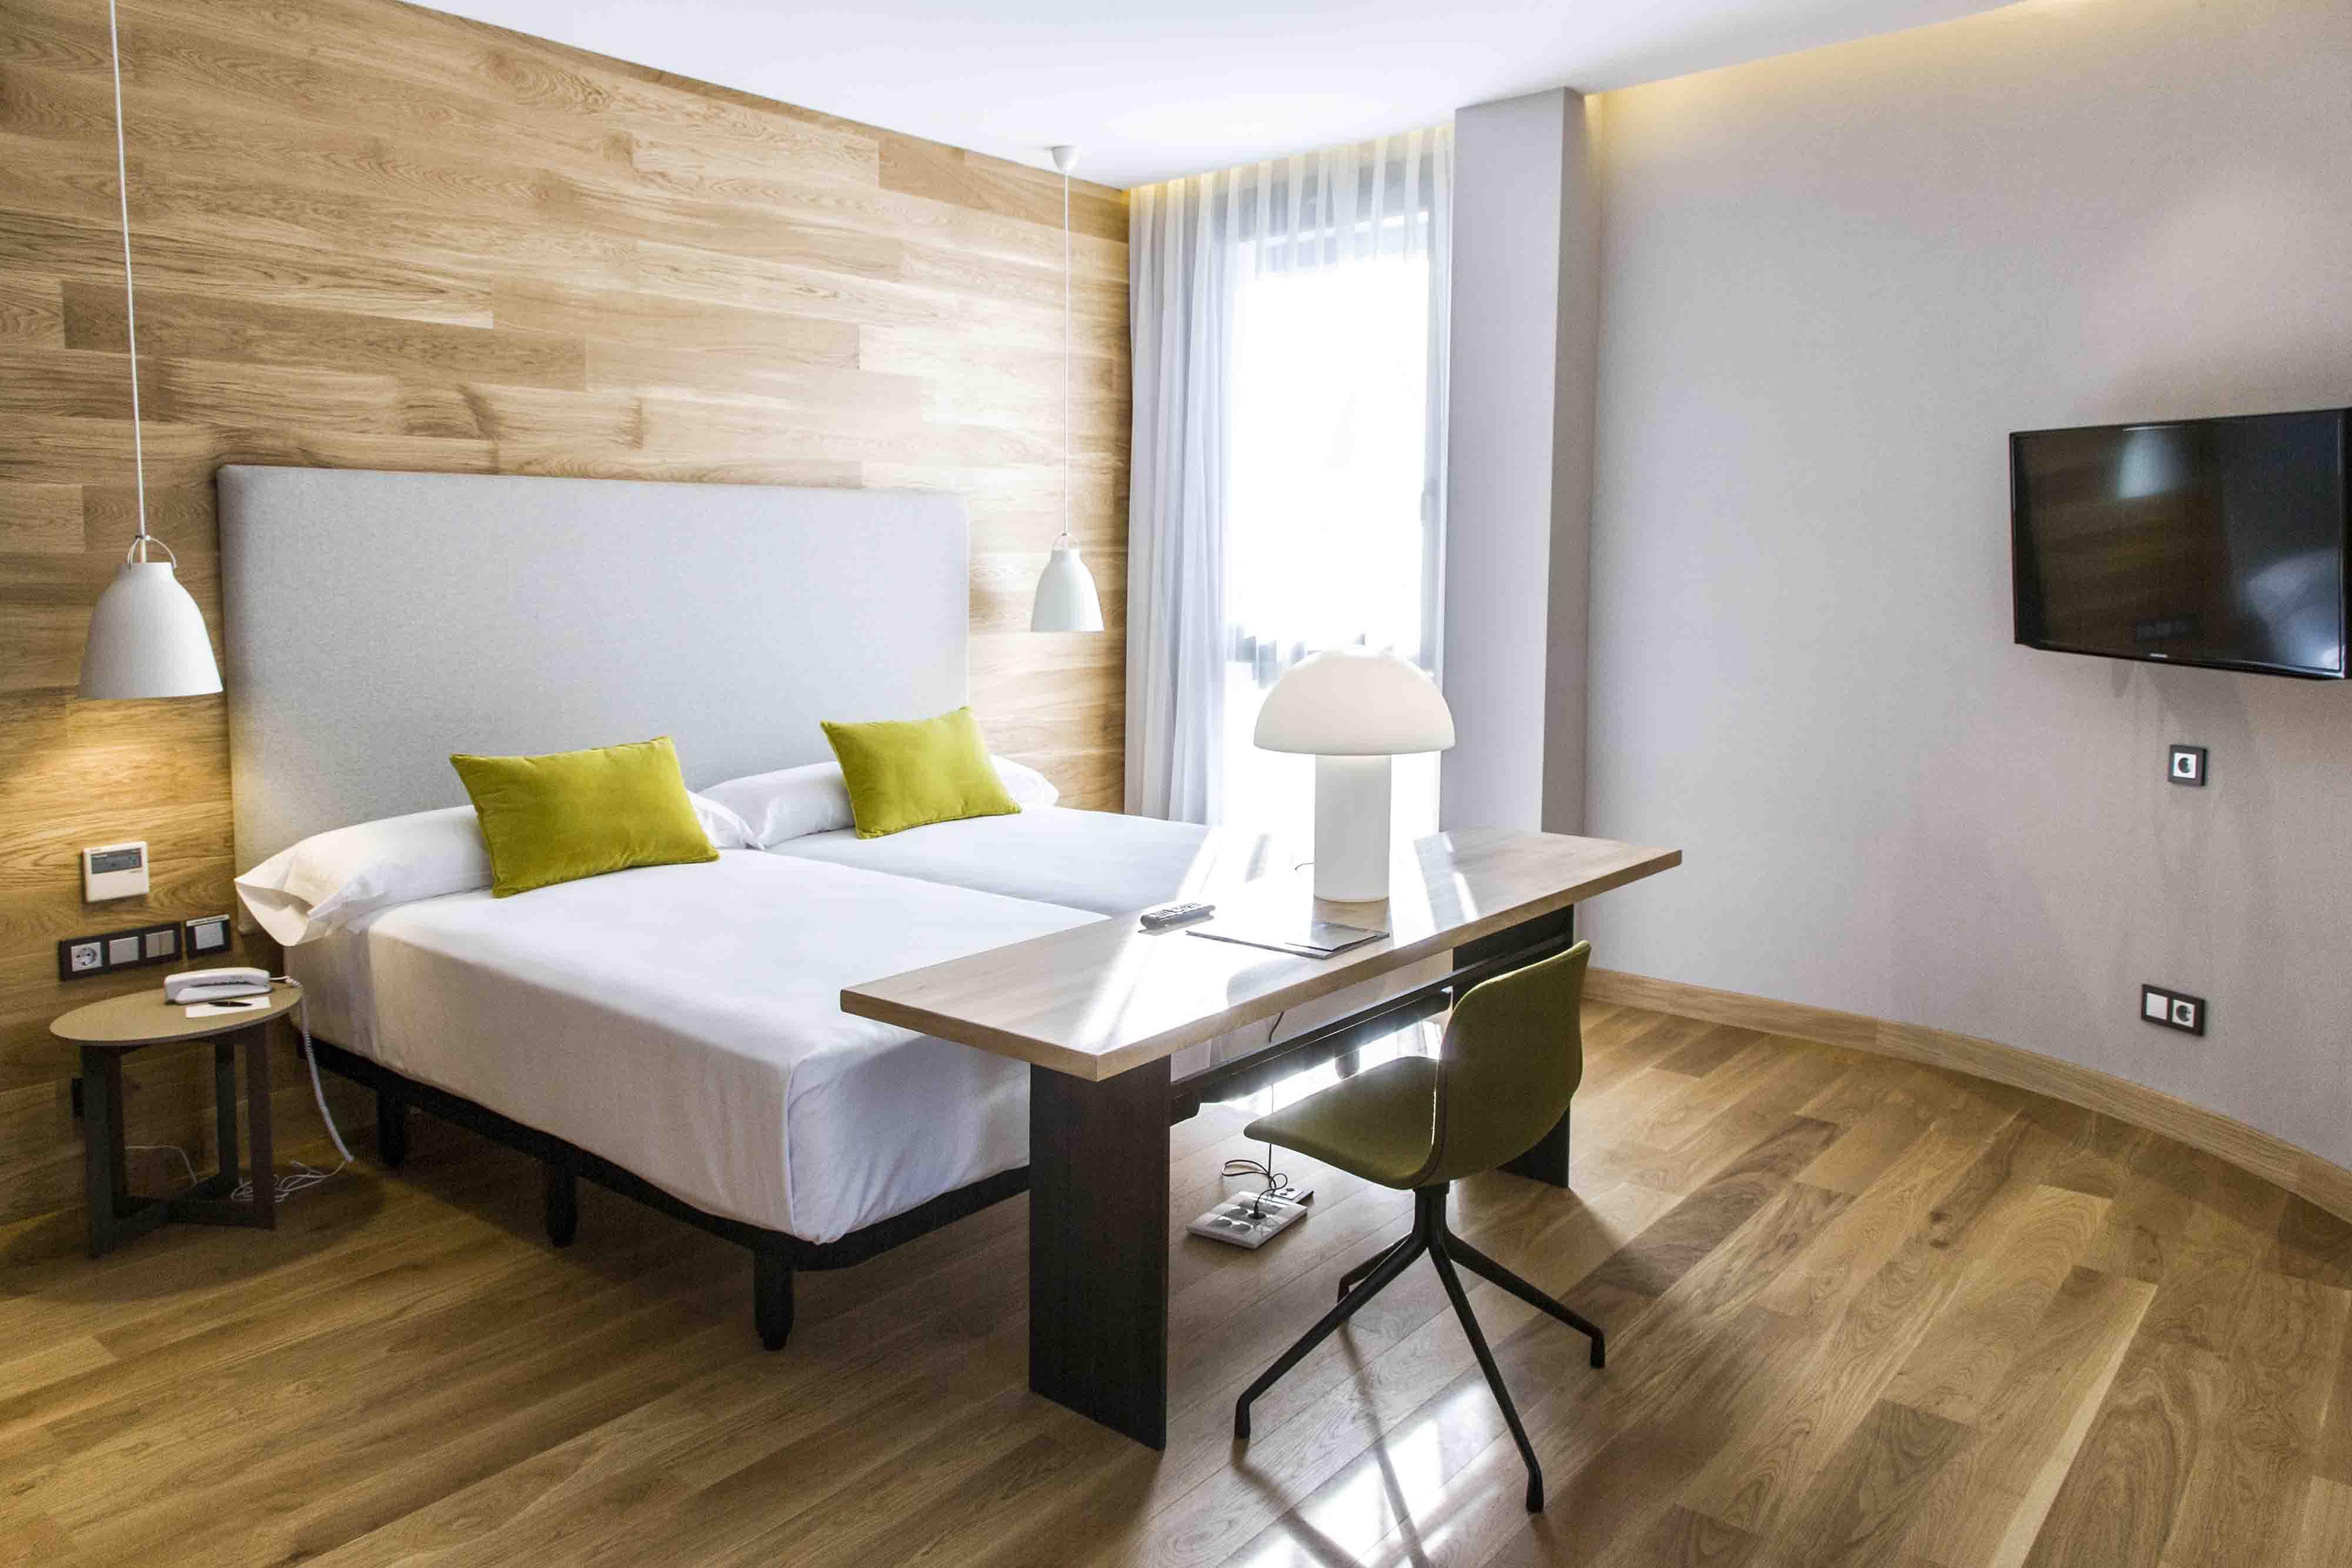 Offer: Room and Moët & Chandon